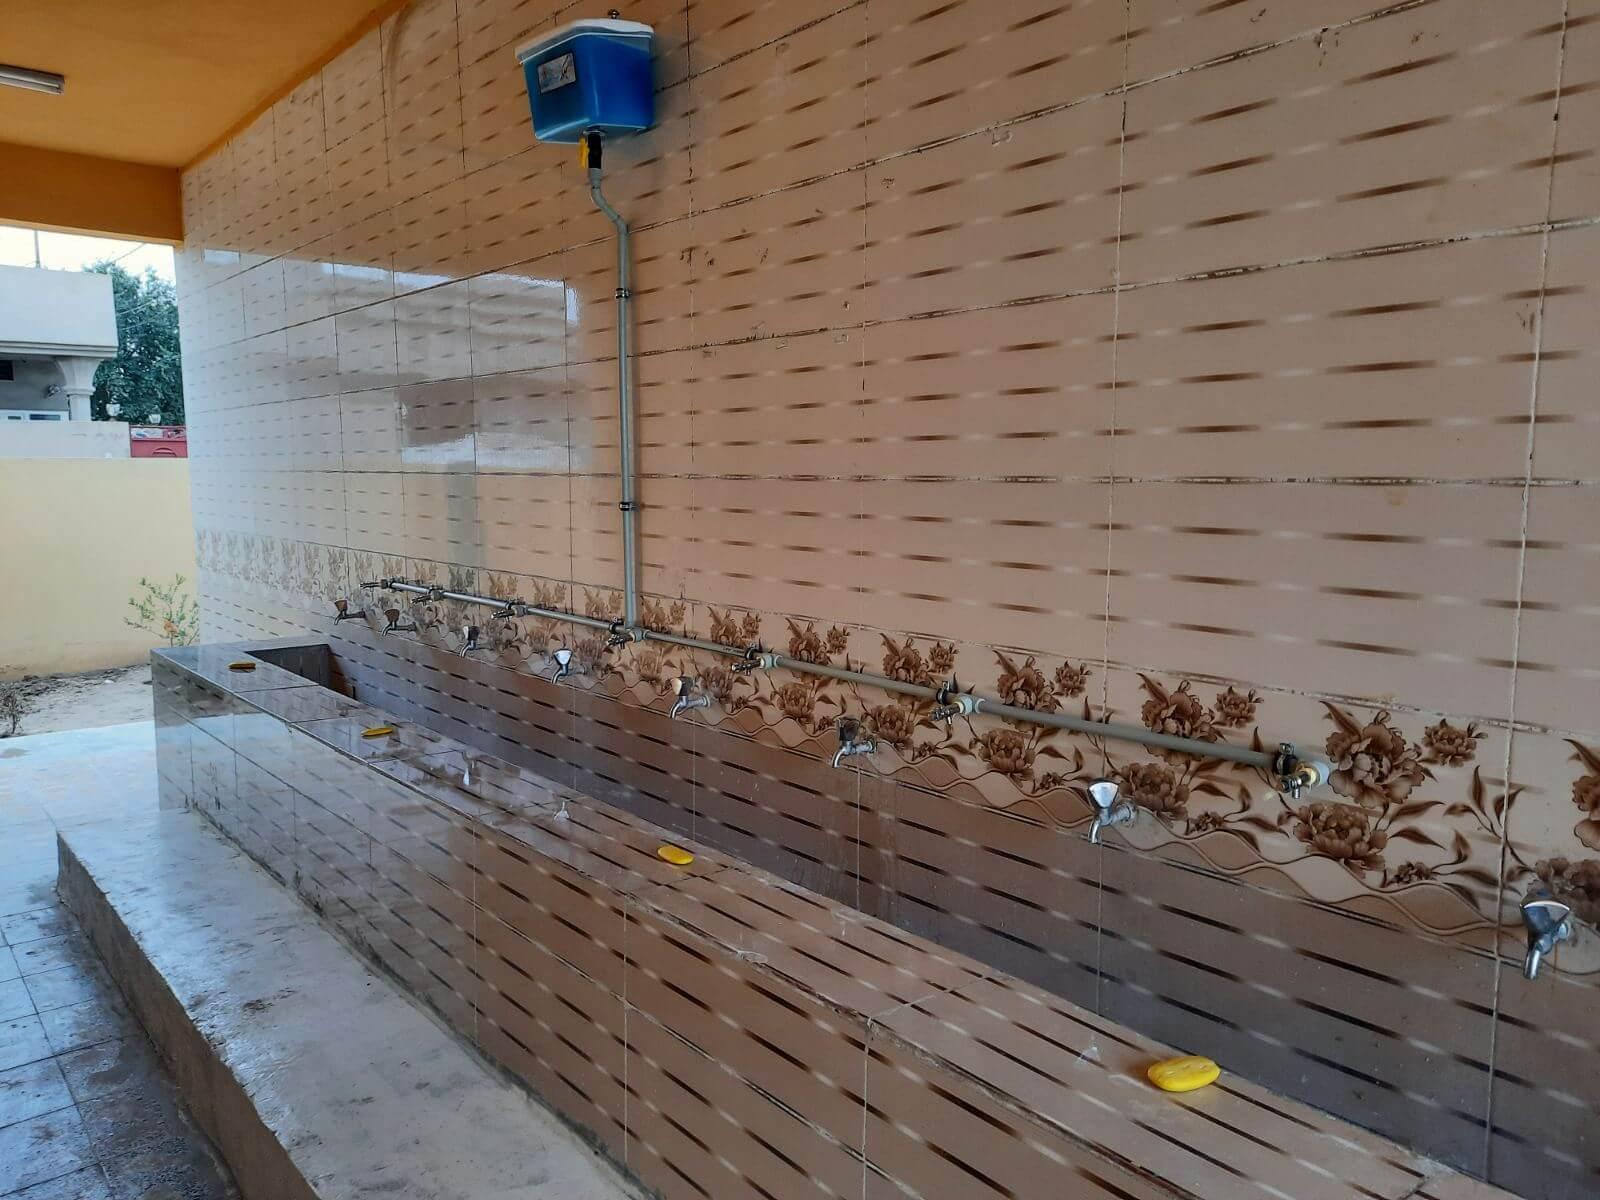 Establishing a liquid handwashing soap system in 12 schools